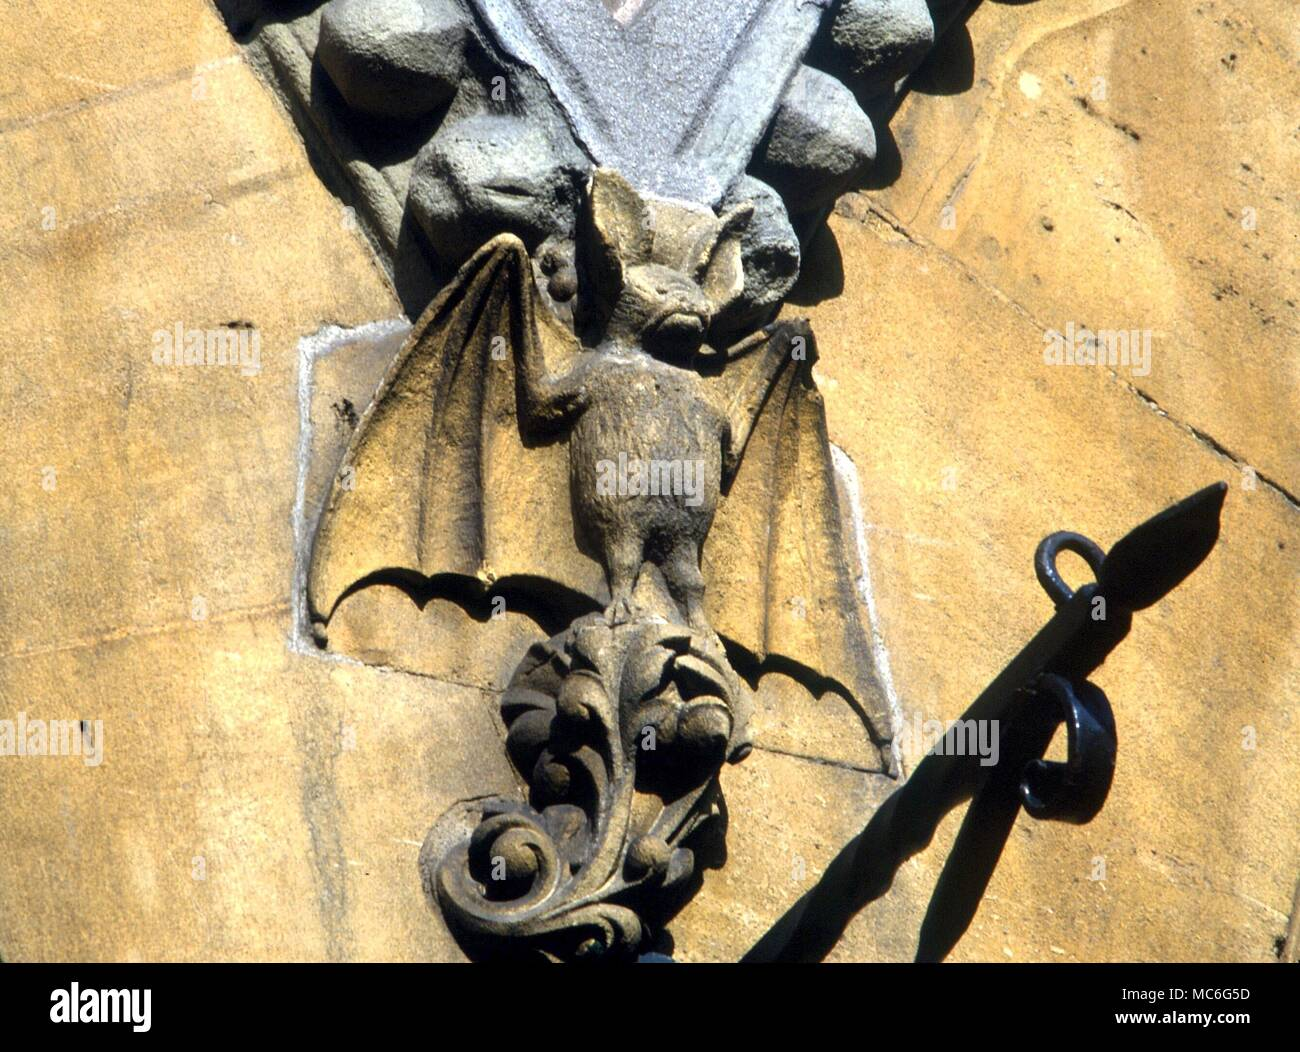 Stone animal sculpturessculpturestatuesstatueanimalsusa made